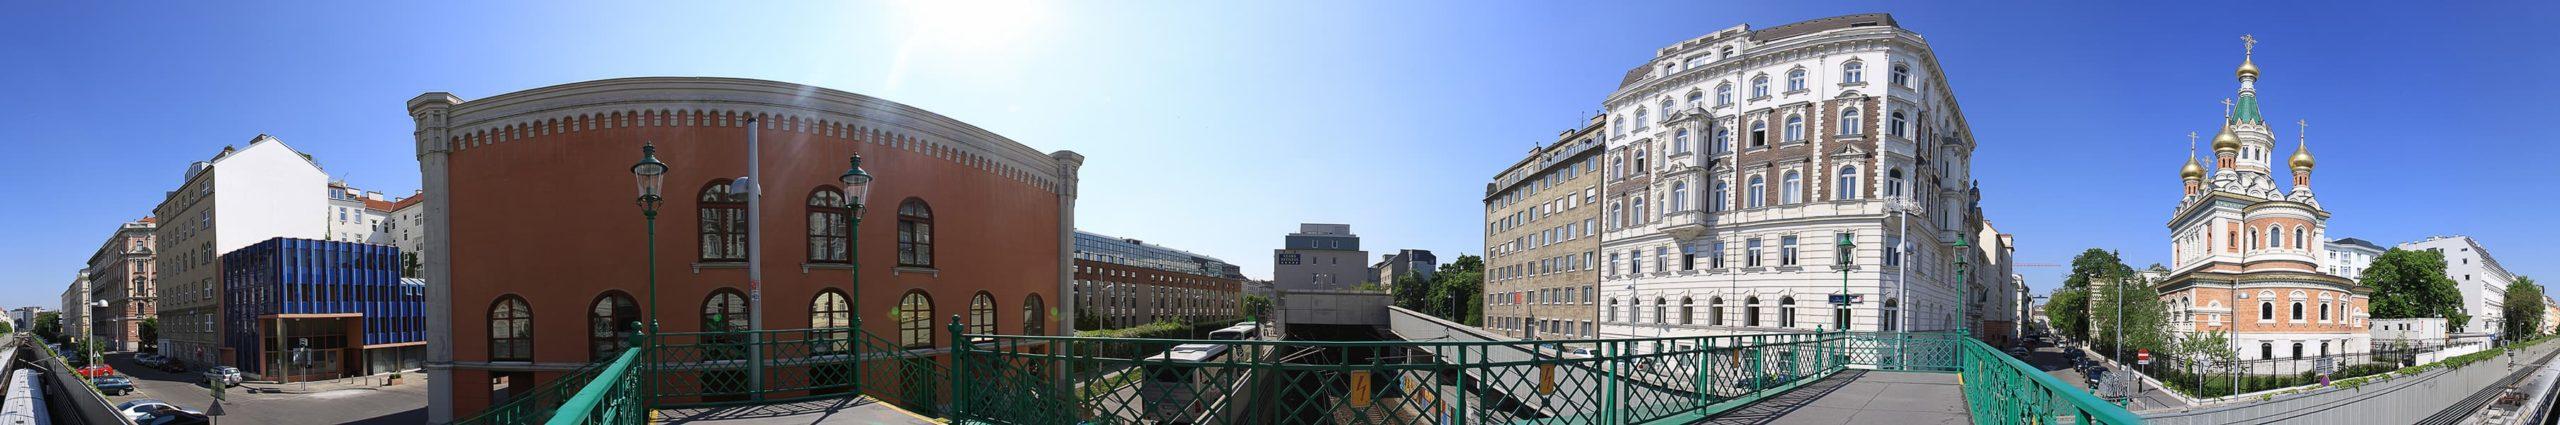 Wien Panorama Russische Kirche